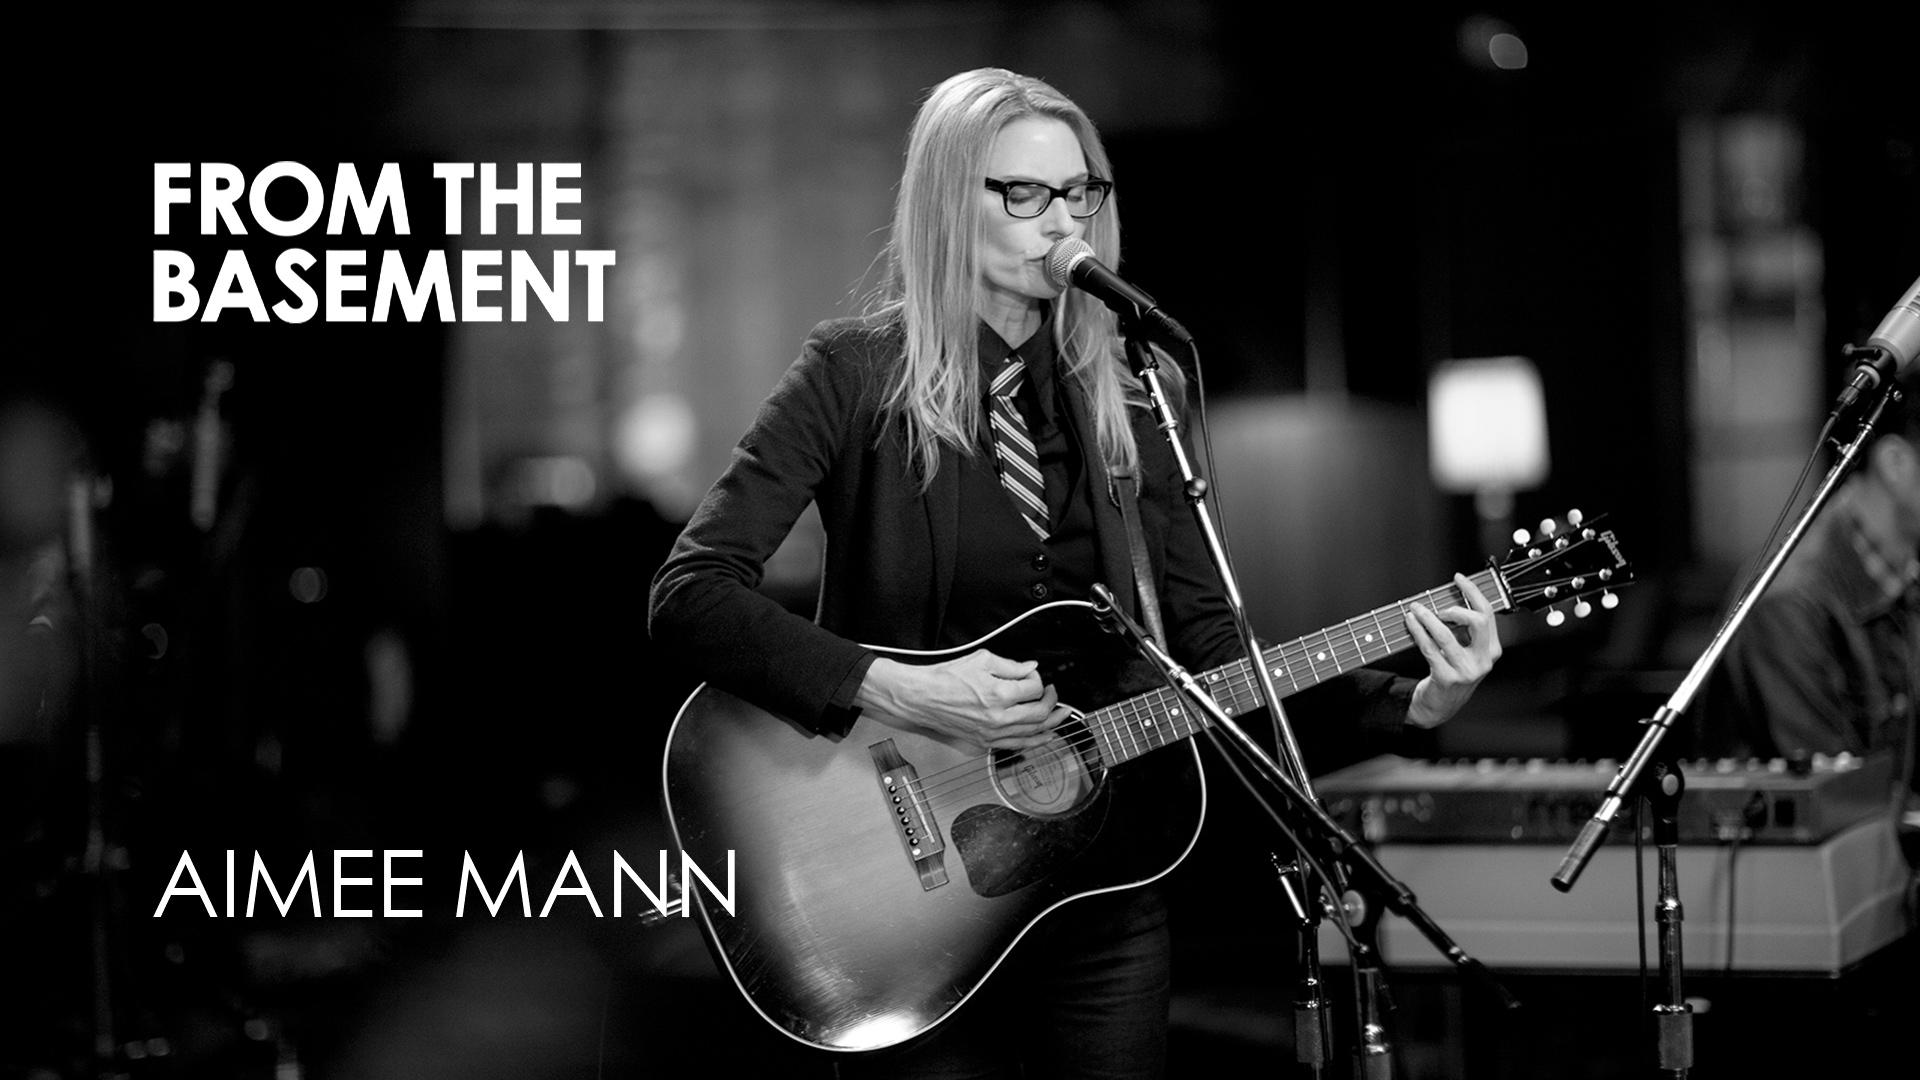 Aimee Mann - From the Basement